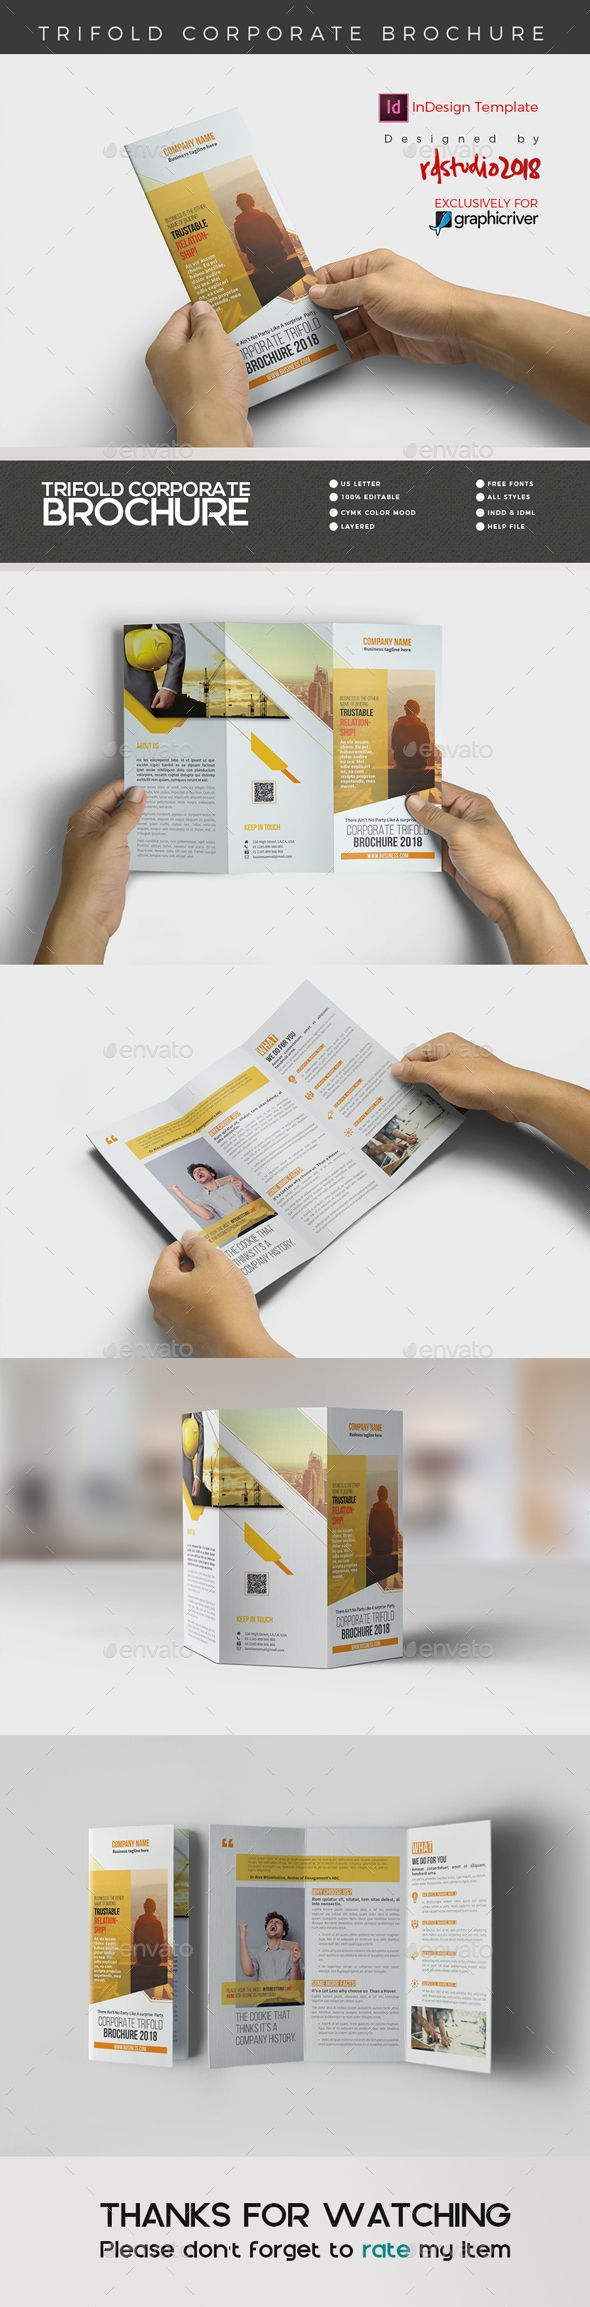 Triflold Brochure Template InDesign INDD